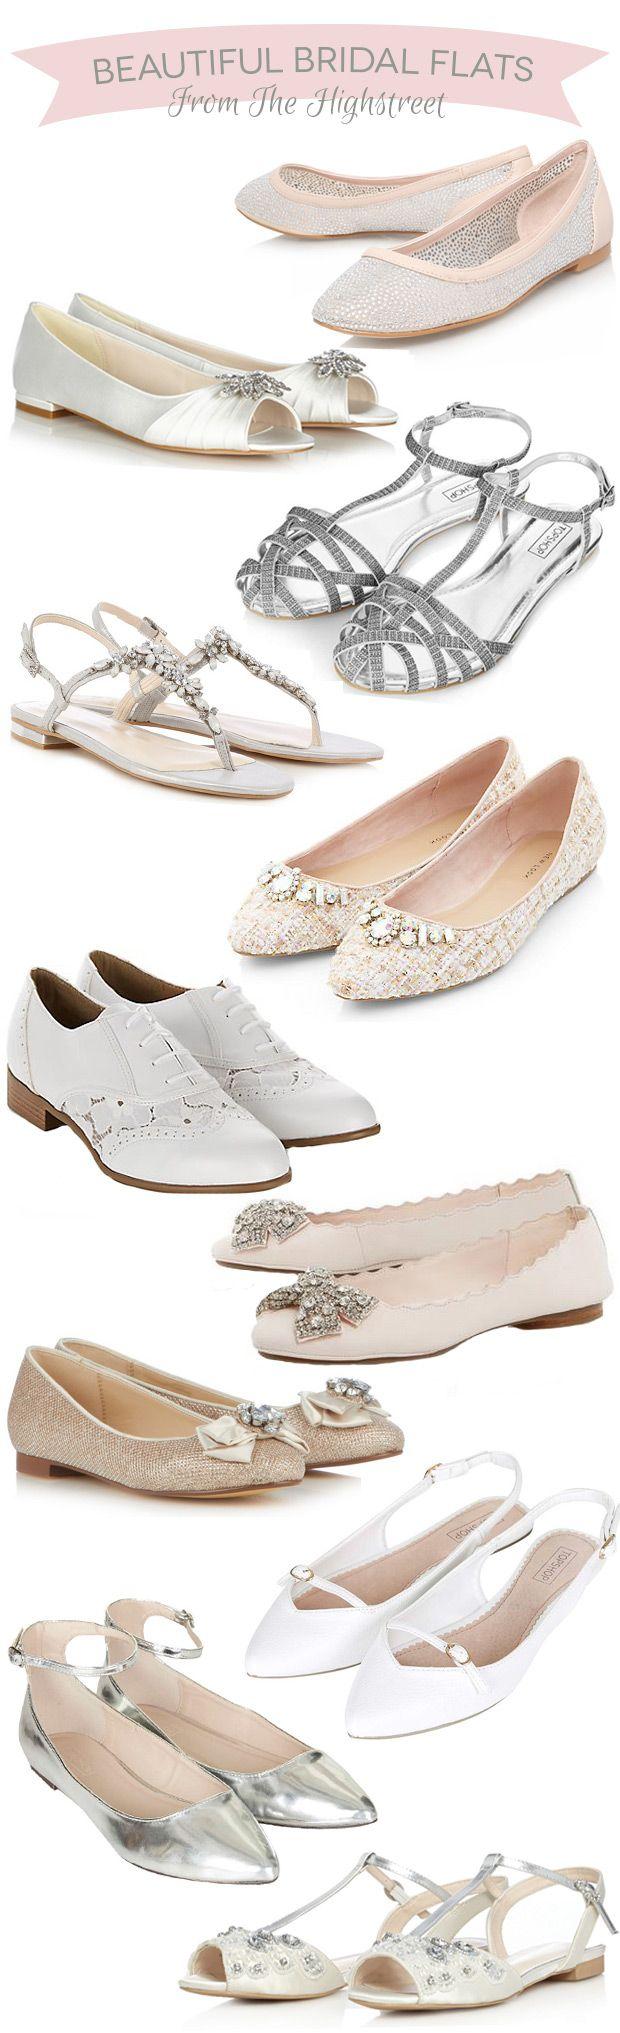 12 Budget Beautiful Flat Bridal Shoes   Flat bridal shoes, Bridal ...